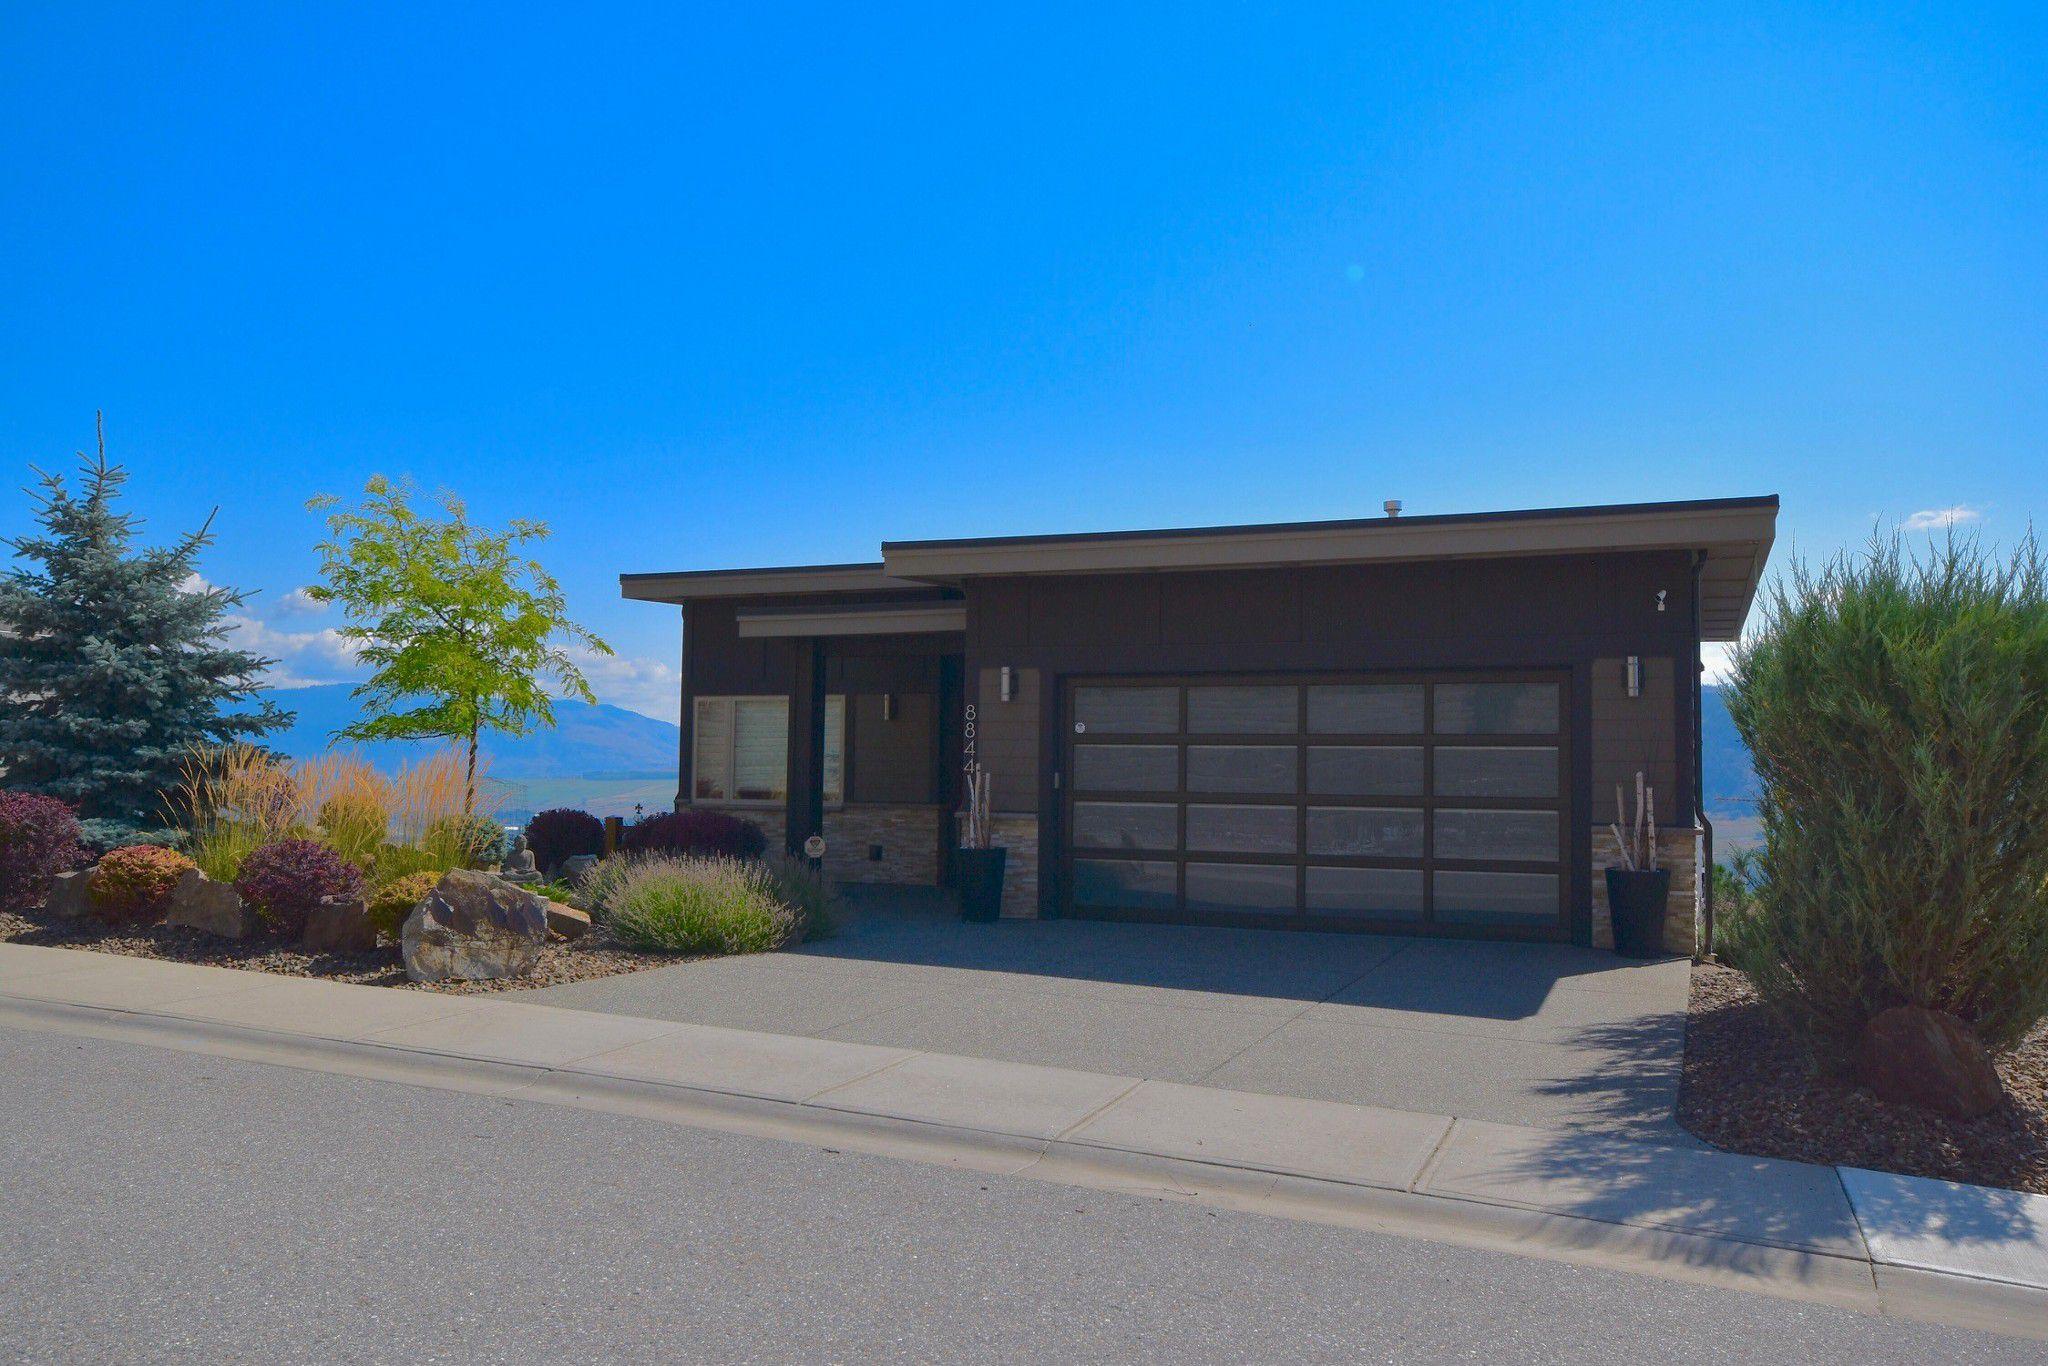 Main Photo: 8844 Tavistock Road in Vernon: Adventure Bay House for sale (North Okanagan)  : MLS®# 10167160